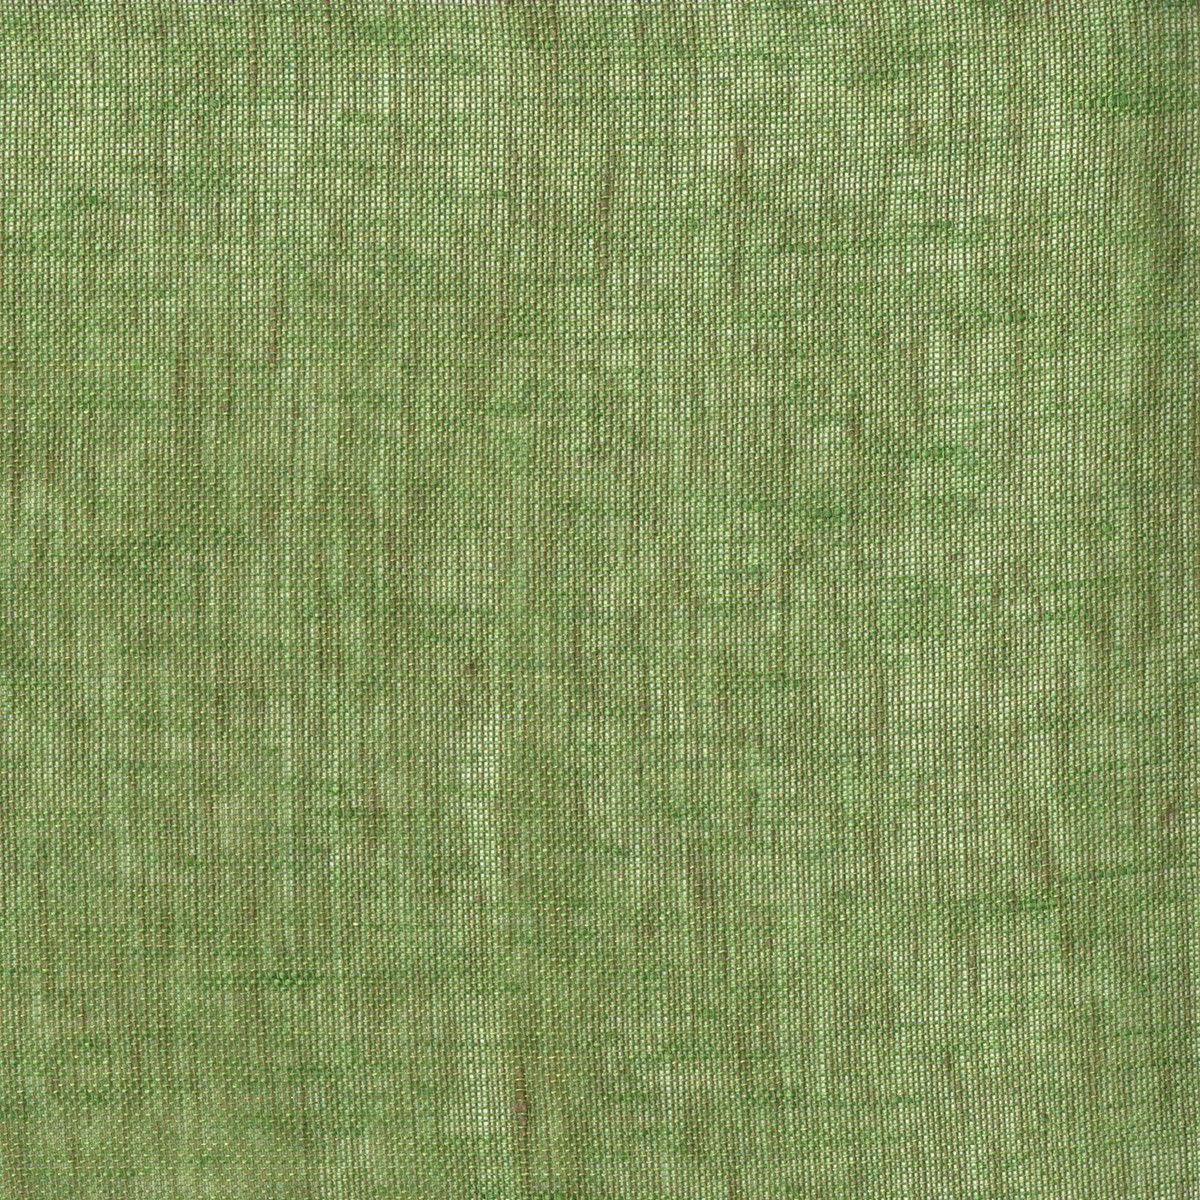 Anichini fabrics linen melange mesh meadow residential for Linen fabric